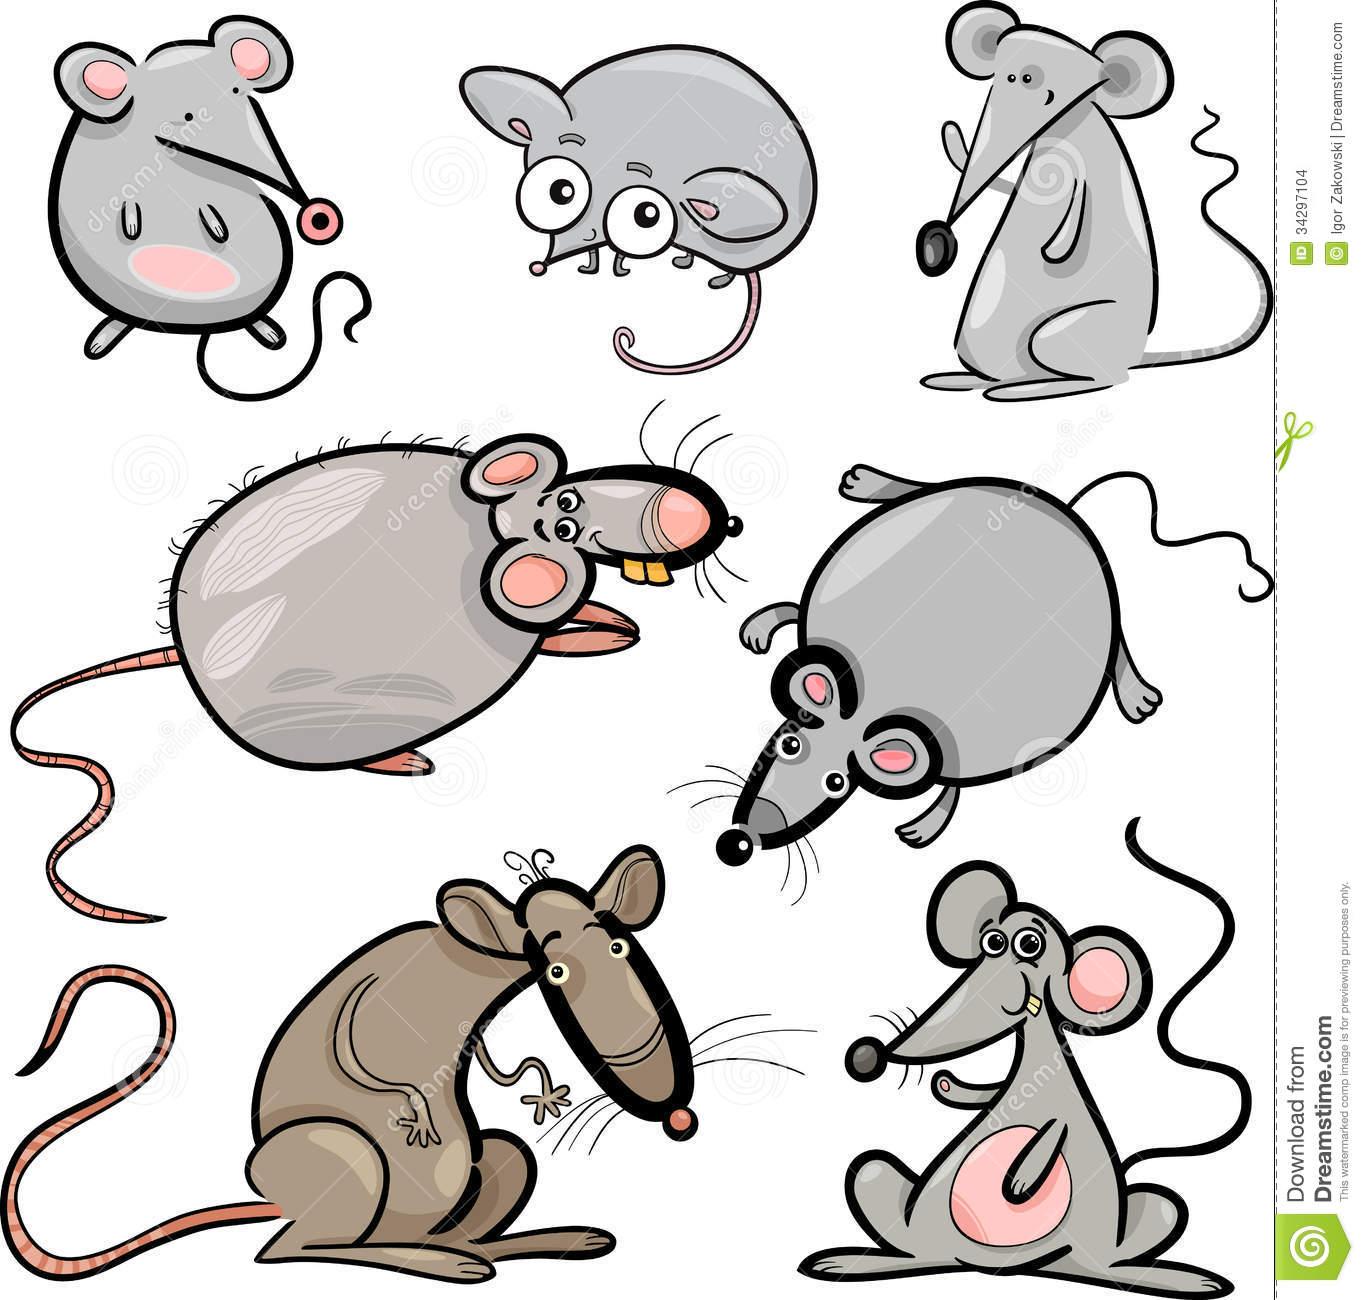 Rat clipart group rat. Mice and rats set